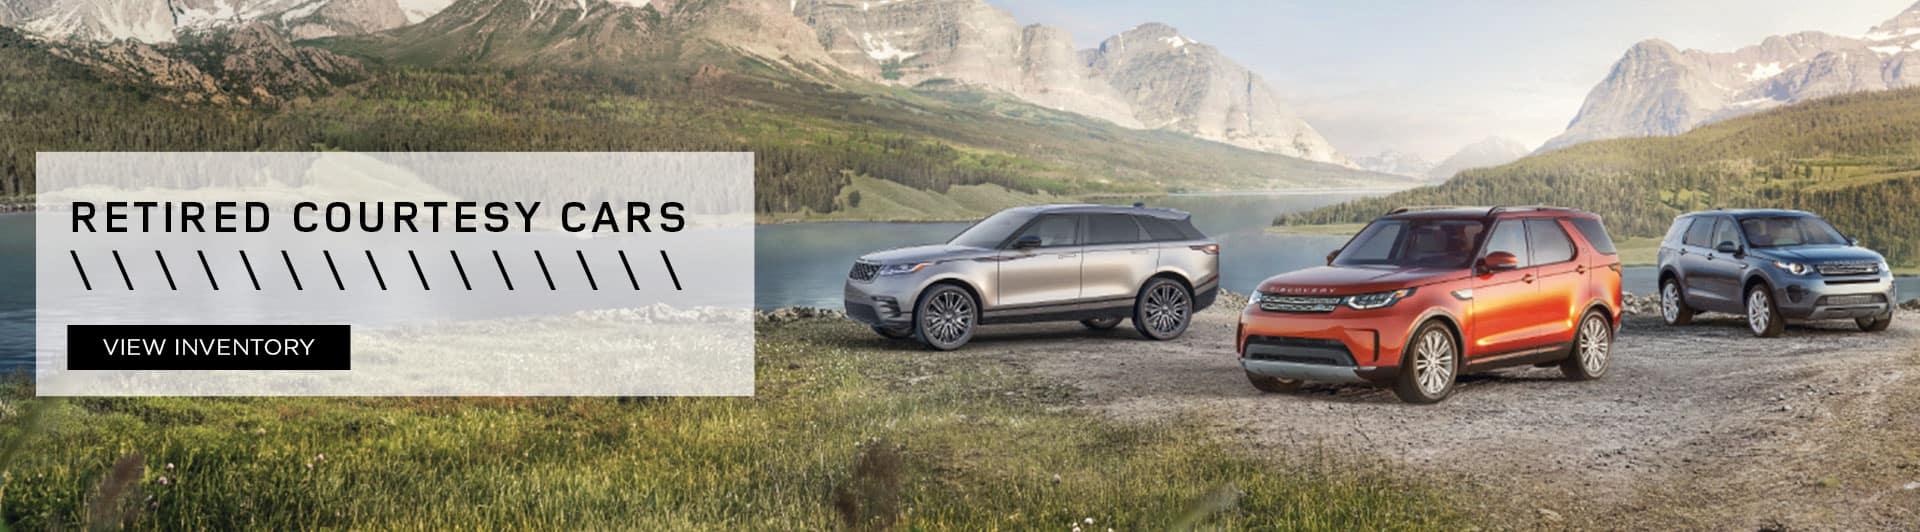 Land Rover Louisville >> Land Rover Louisville Land Rover Dealer In Louisville Ky